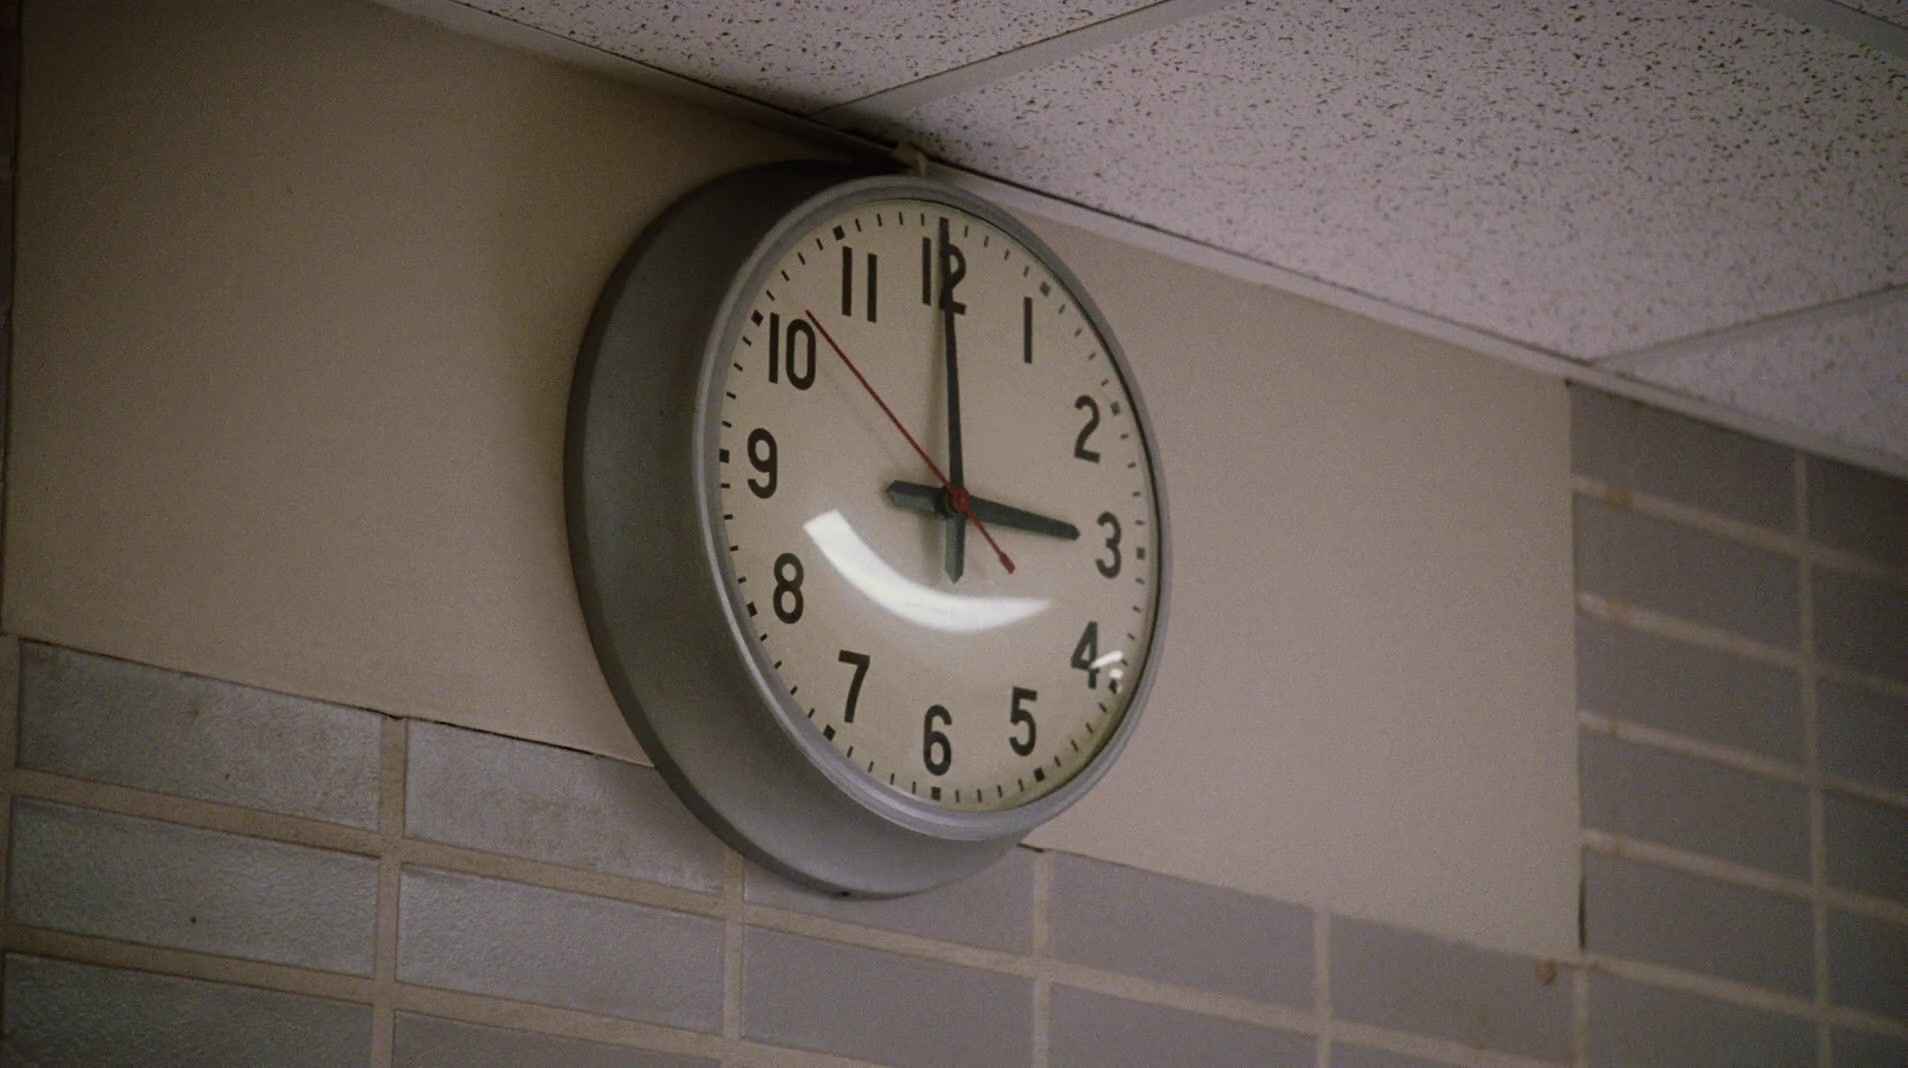 perks of being a wallflower clocks